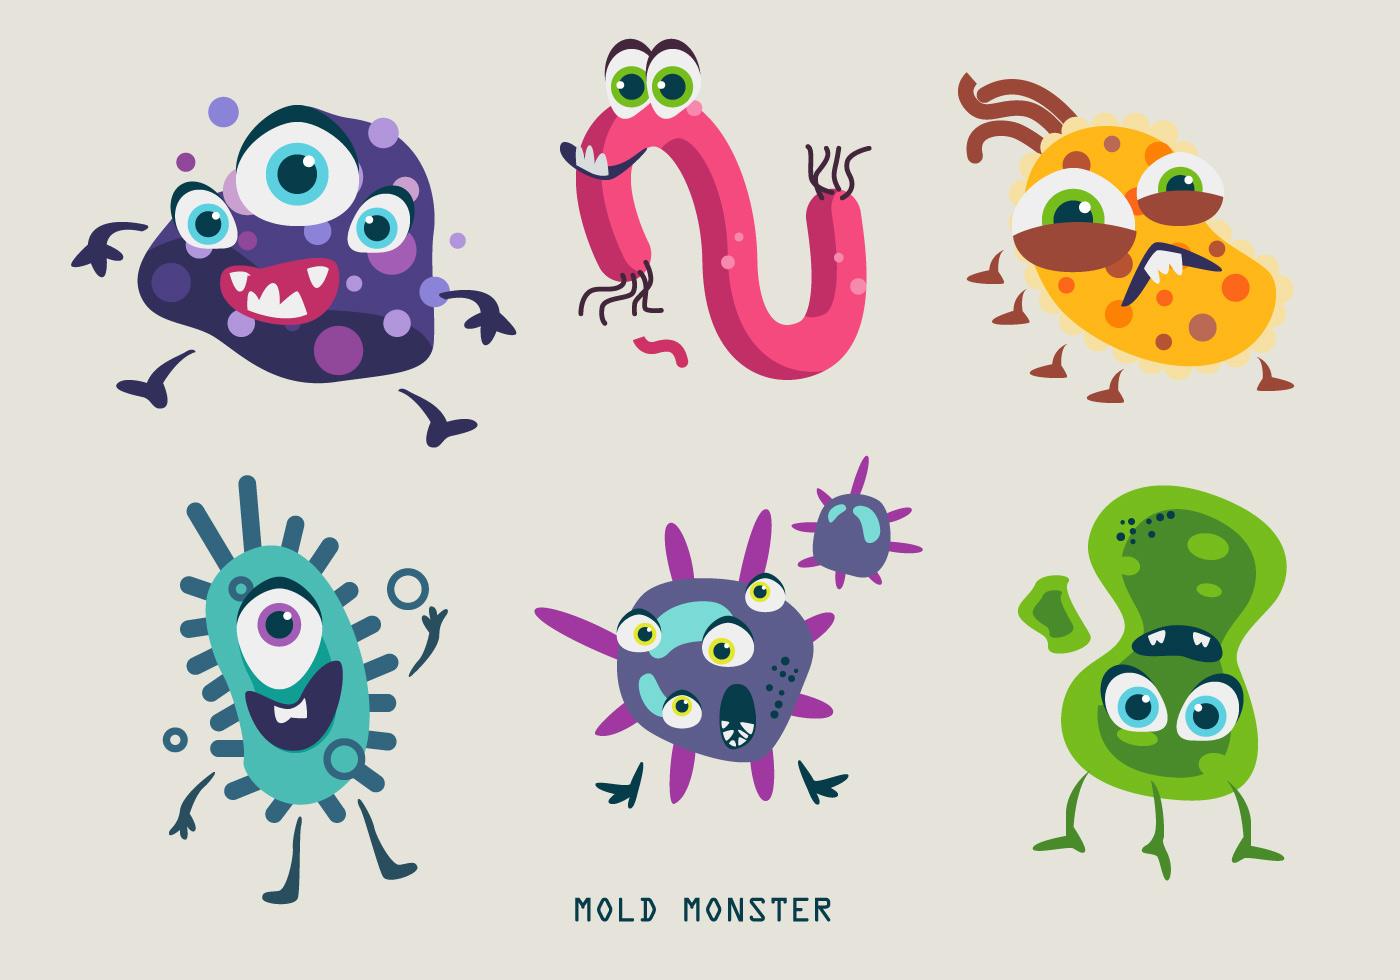 Vector Character Design Illustrator : Mold bacteria monster character vector illustration